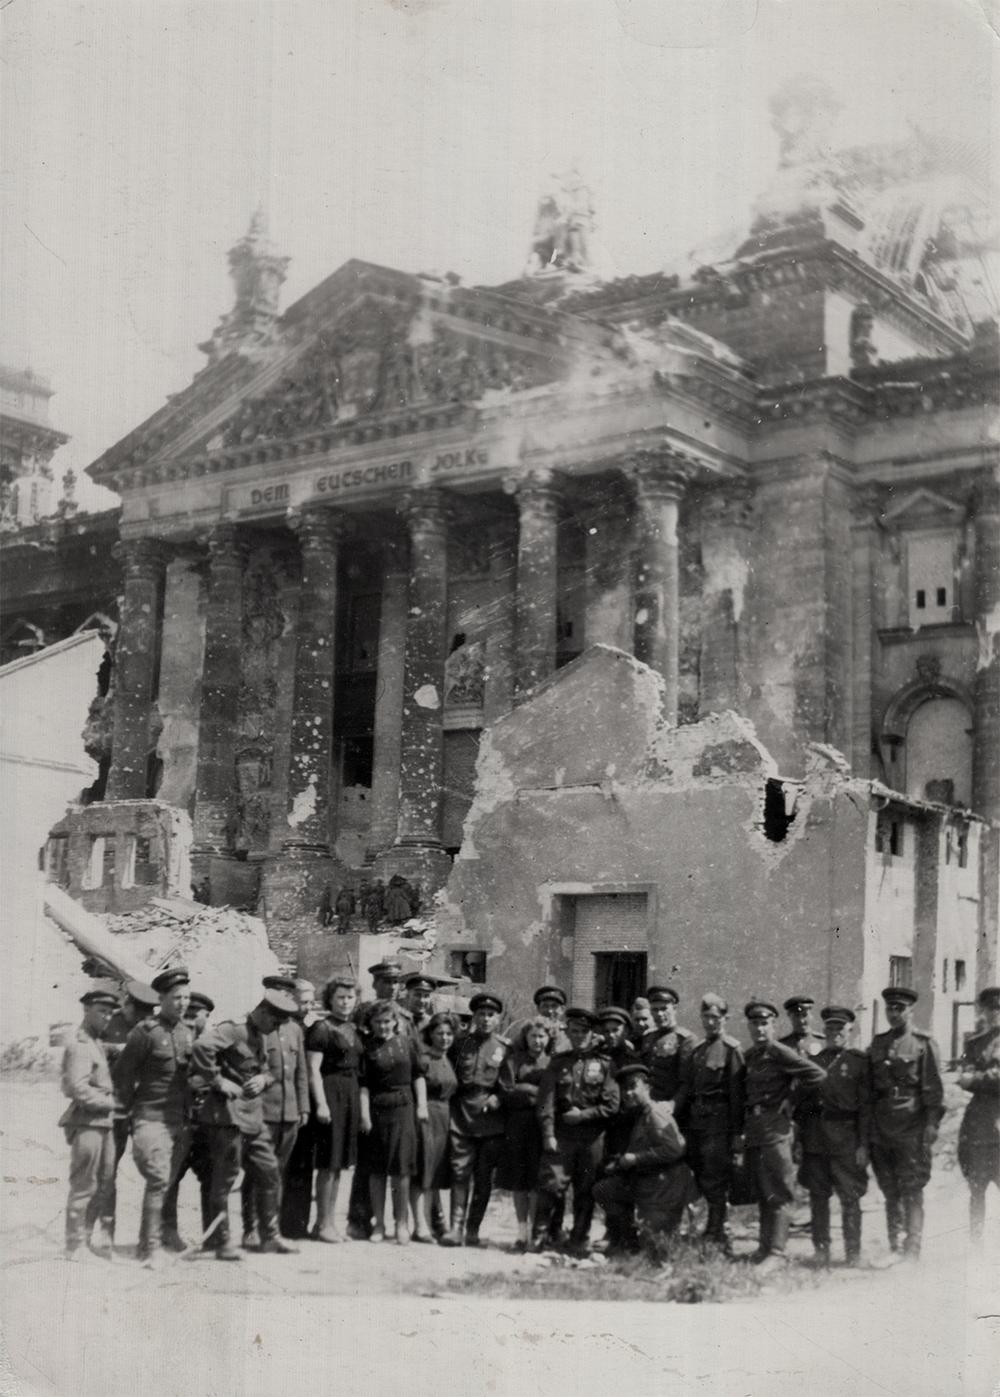 Mark Rudnitsky and fellow combatants, victory photo. Berlin, 1945.